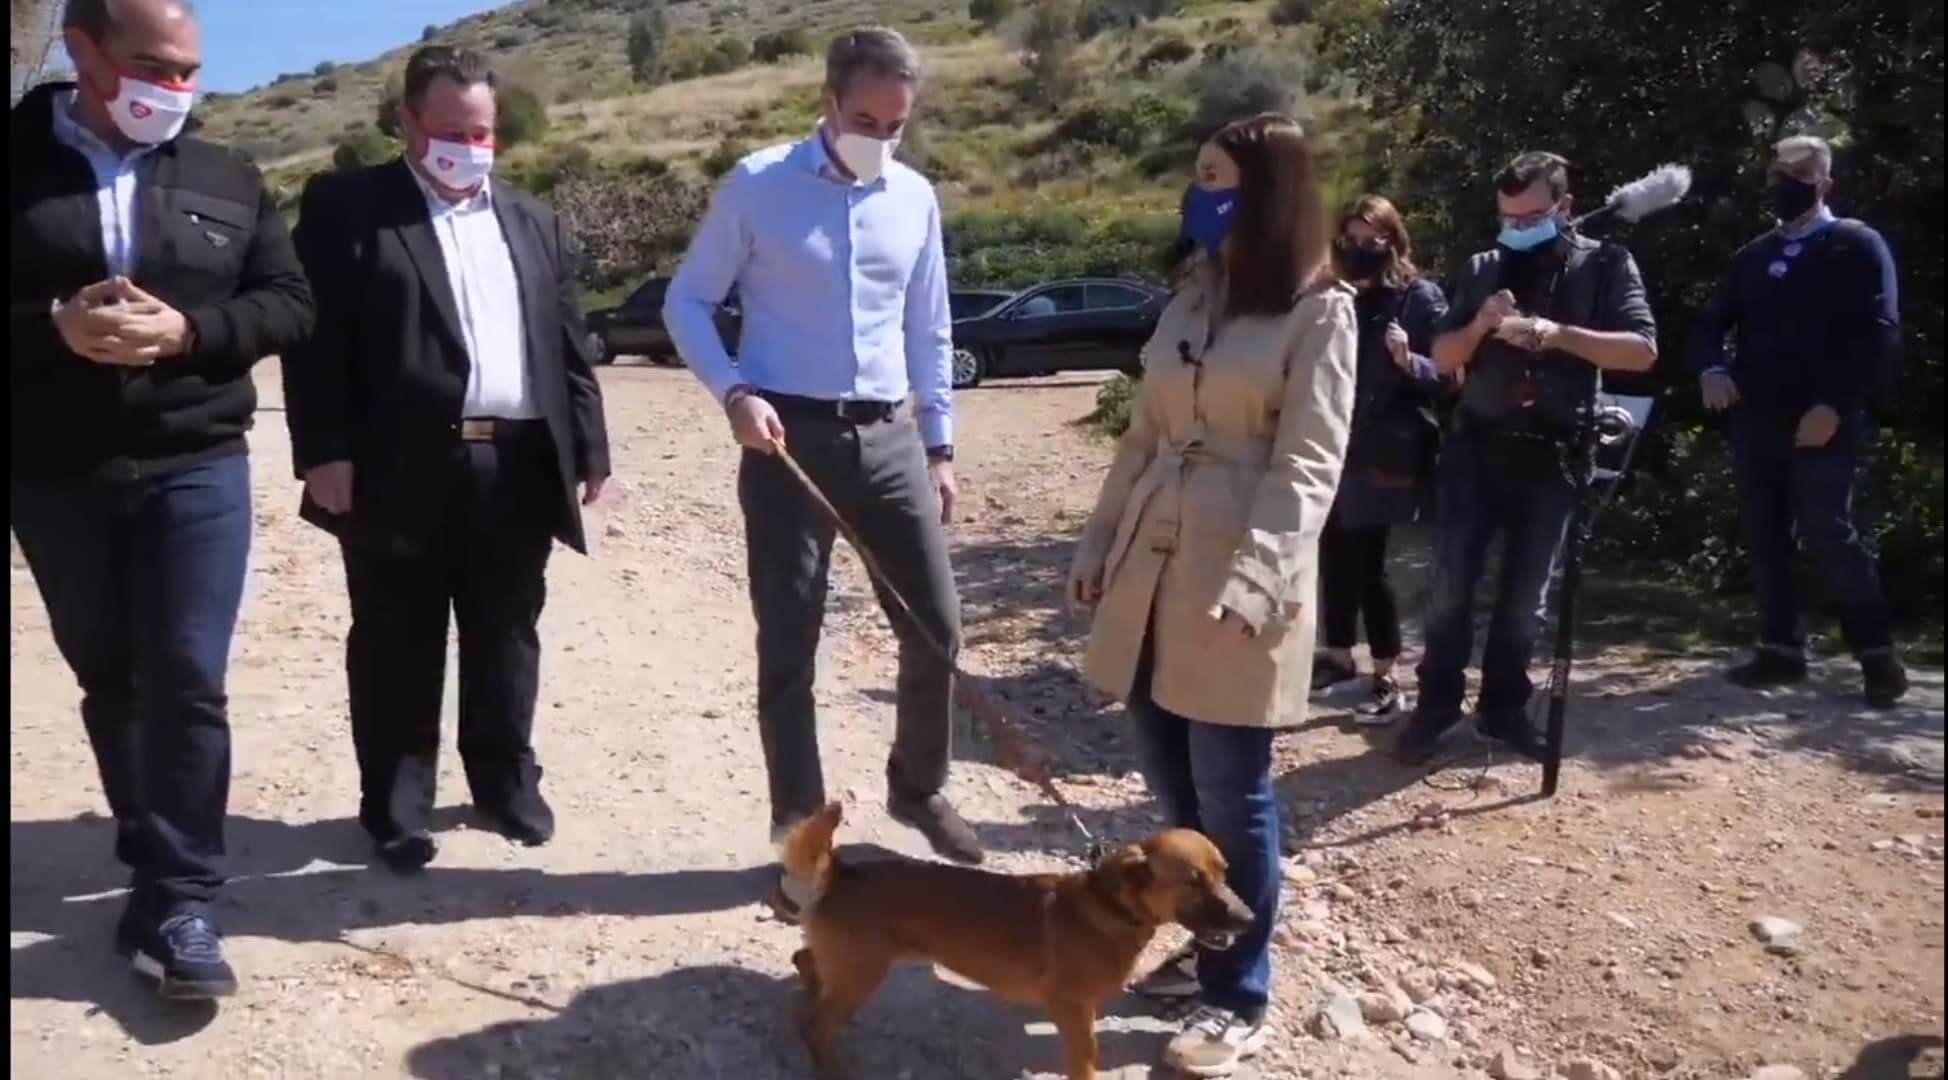 Eπίσκεψη του Κυριάκου Μητσοτάκη στο καταφύγιο αδέσποτων ζώων στην Ηλιούπολη